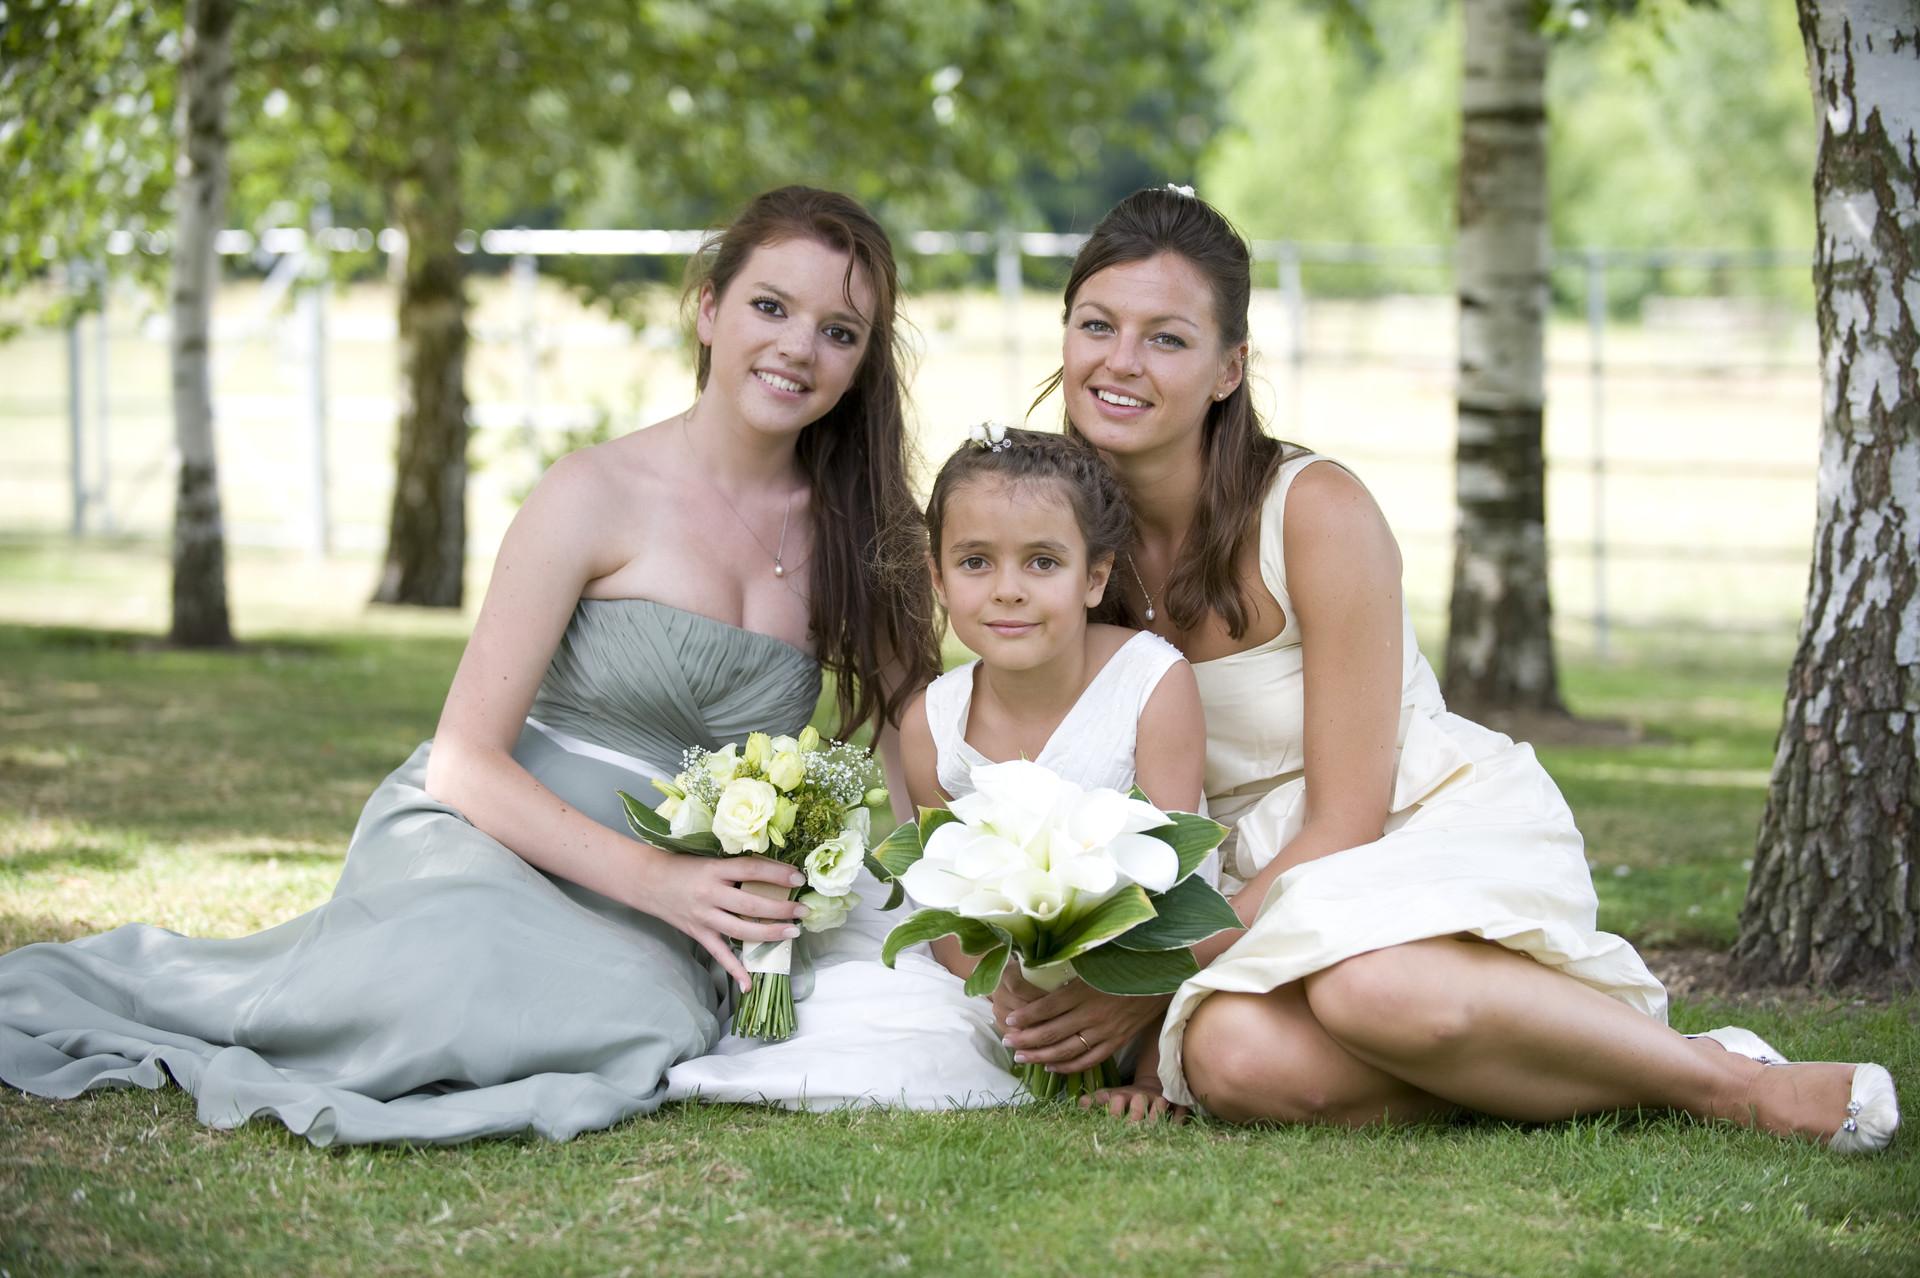 A Bride's Maids